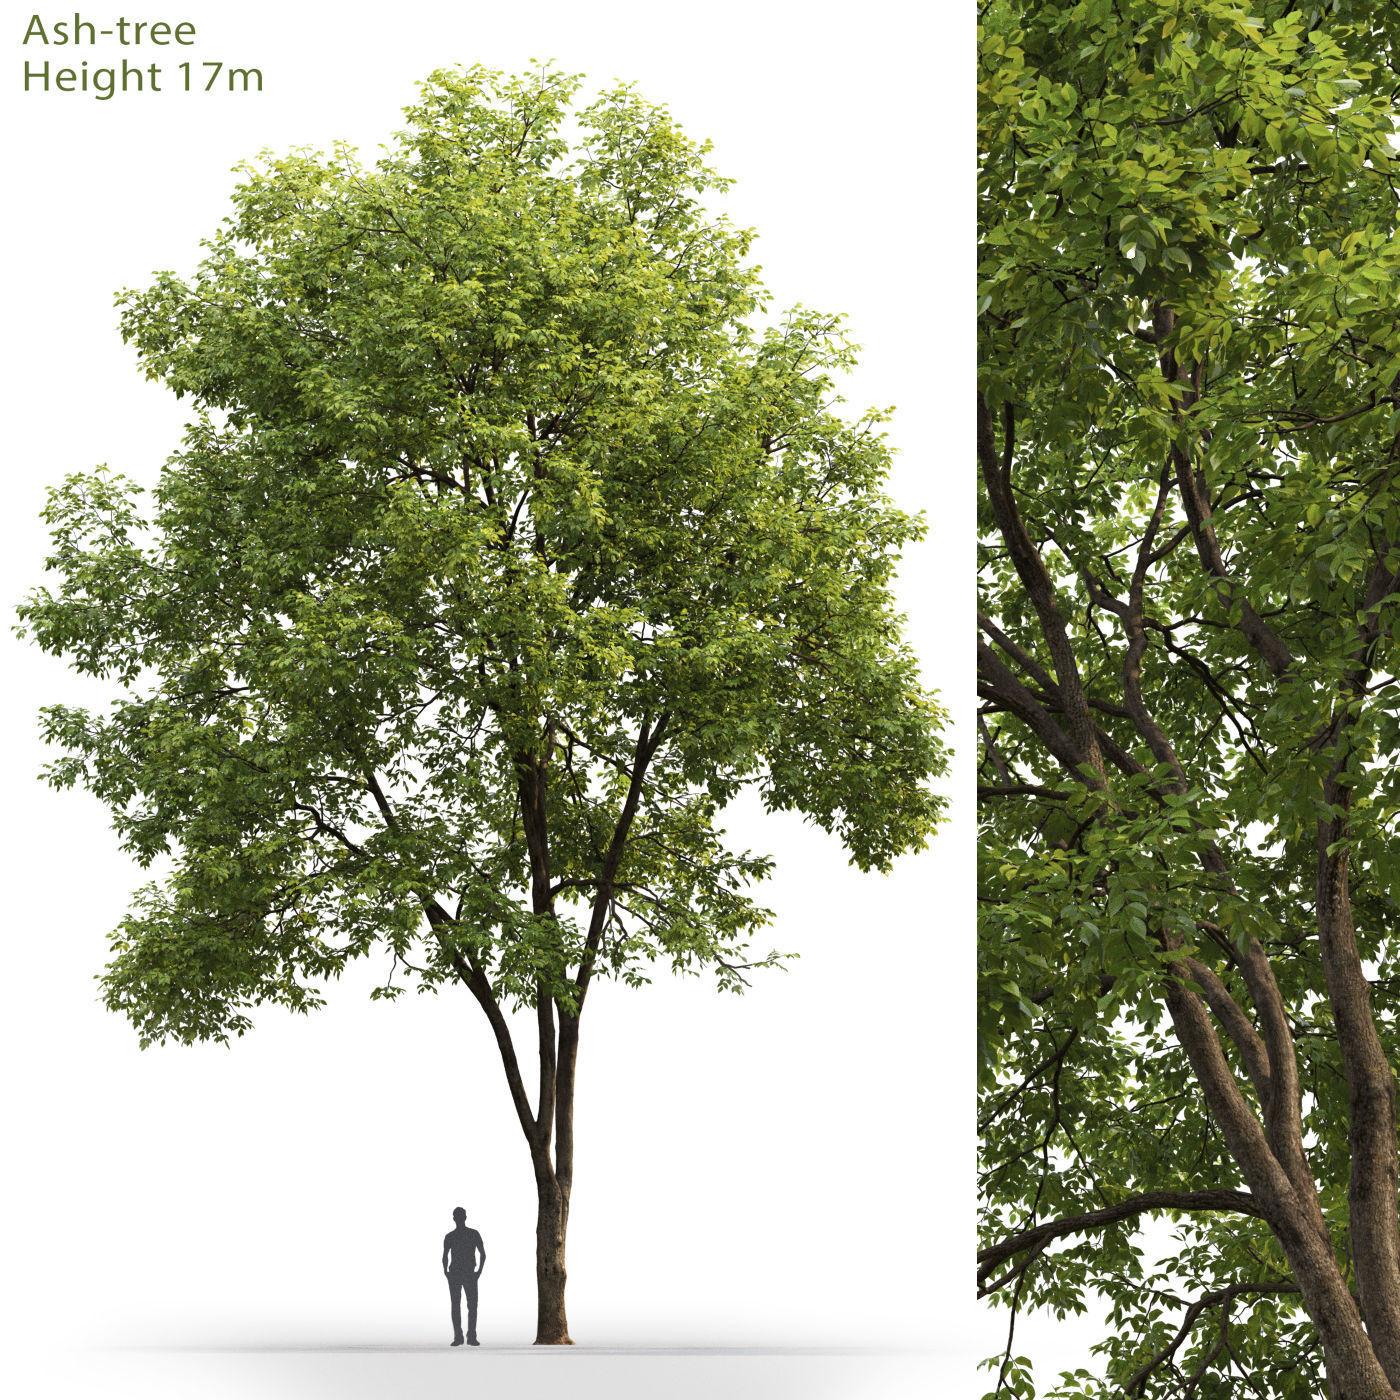 Ash-tree 03 H17m